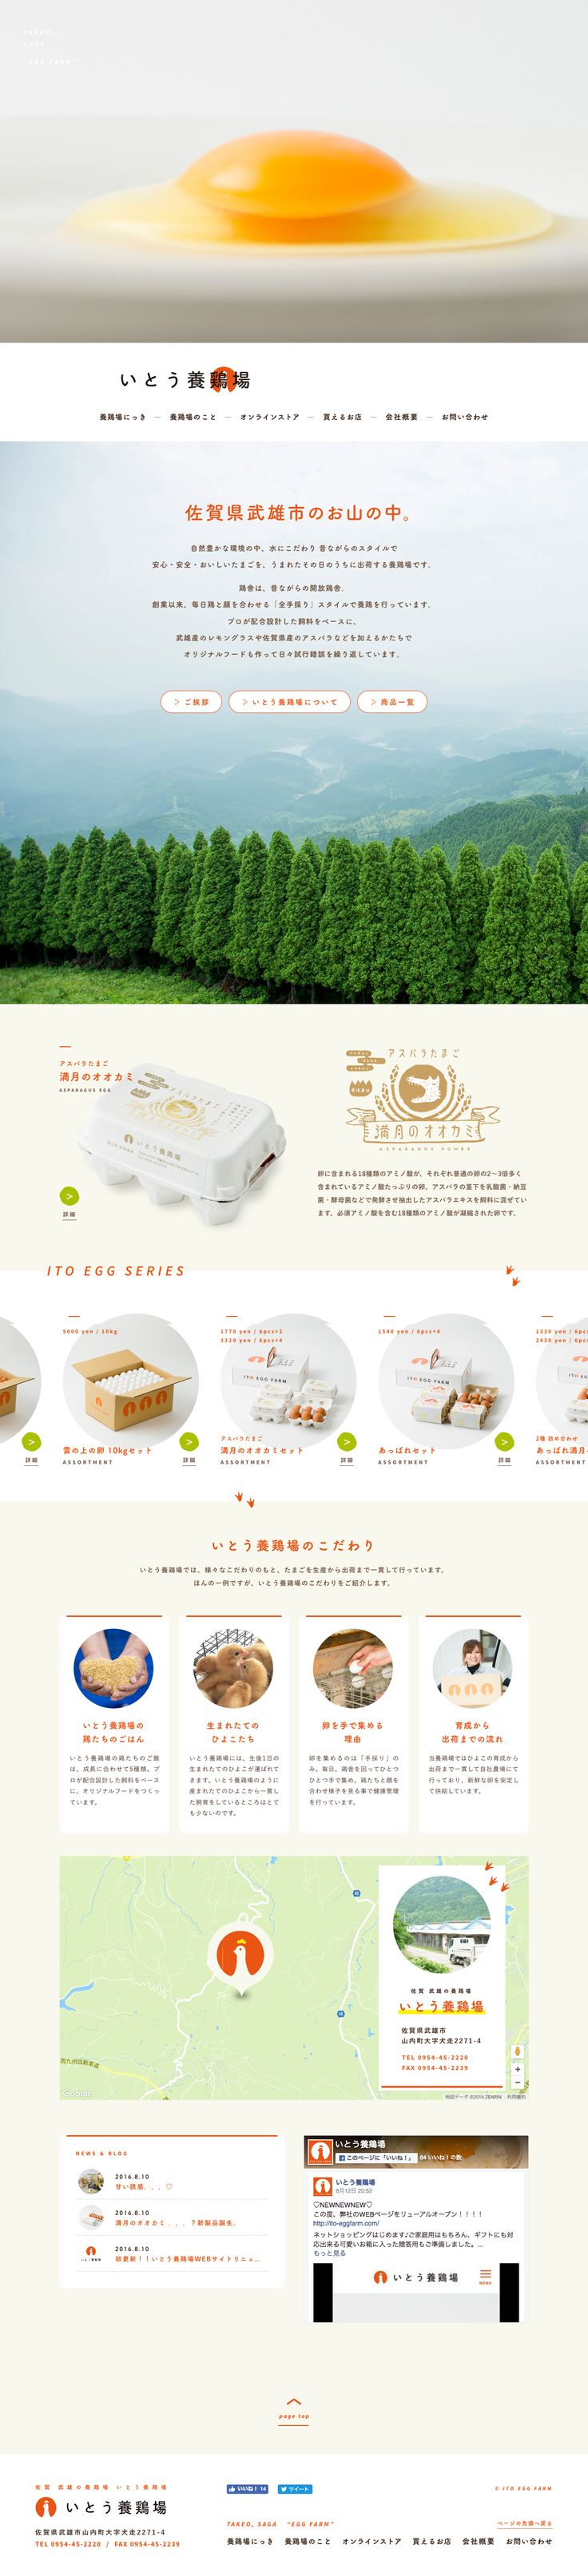 「81-web.com」はWebサイト制作に役立つ、日本の優れたデザインのWebデザイン・Webサイトギャラリー&リンク集です。